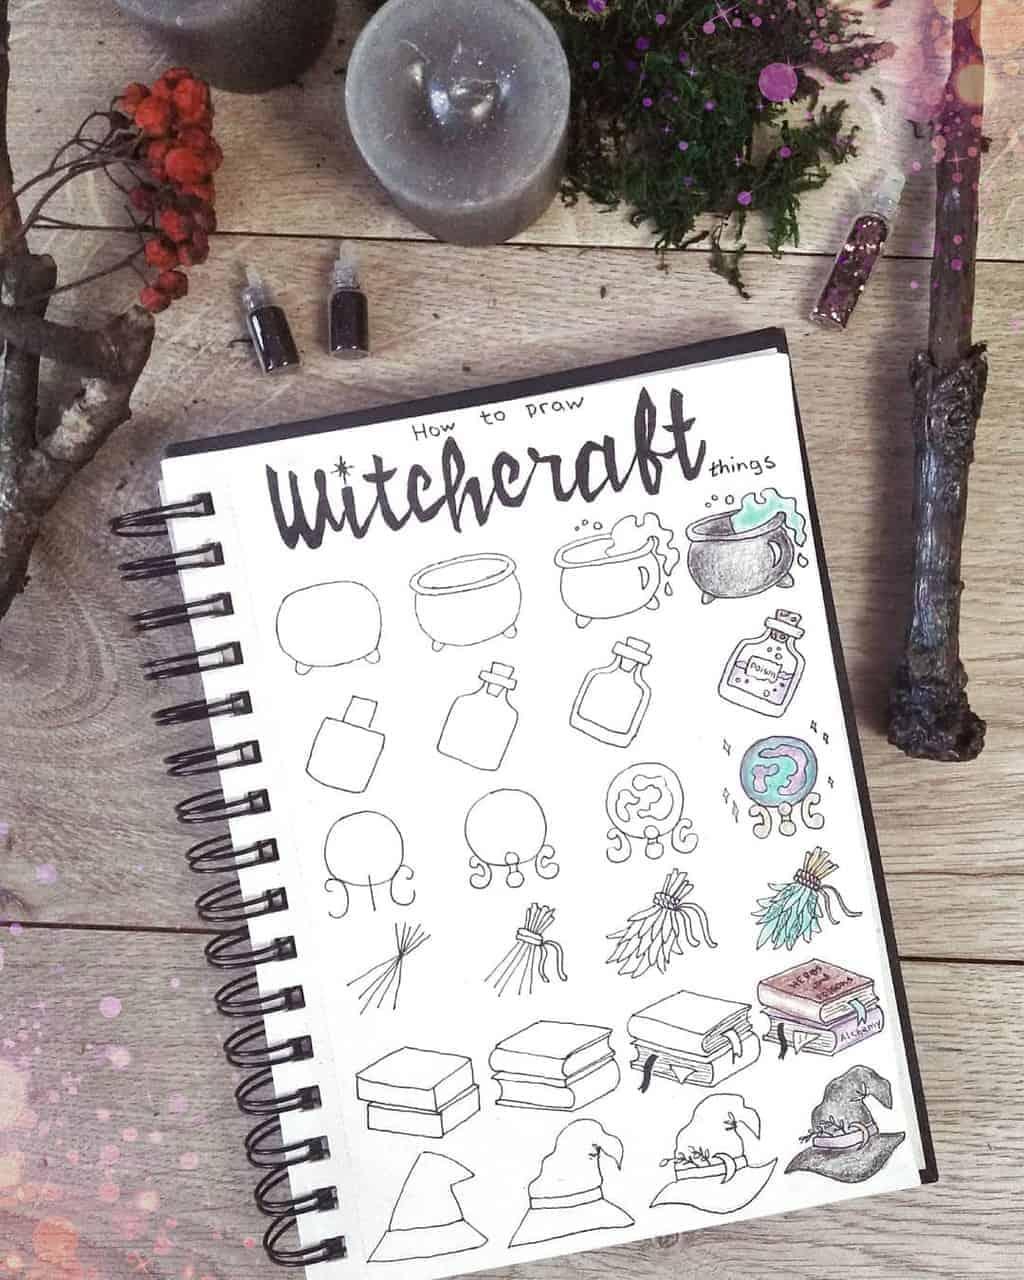 Halloween Bullet Journal Doodles by @ginger.bullet.journal | Masha Plans